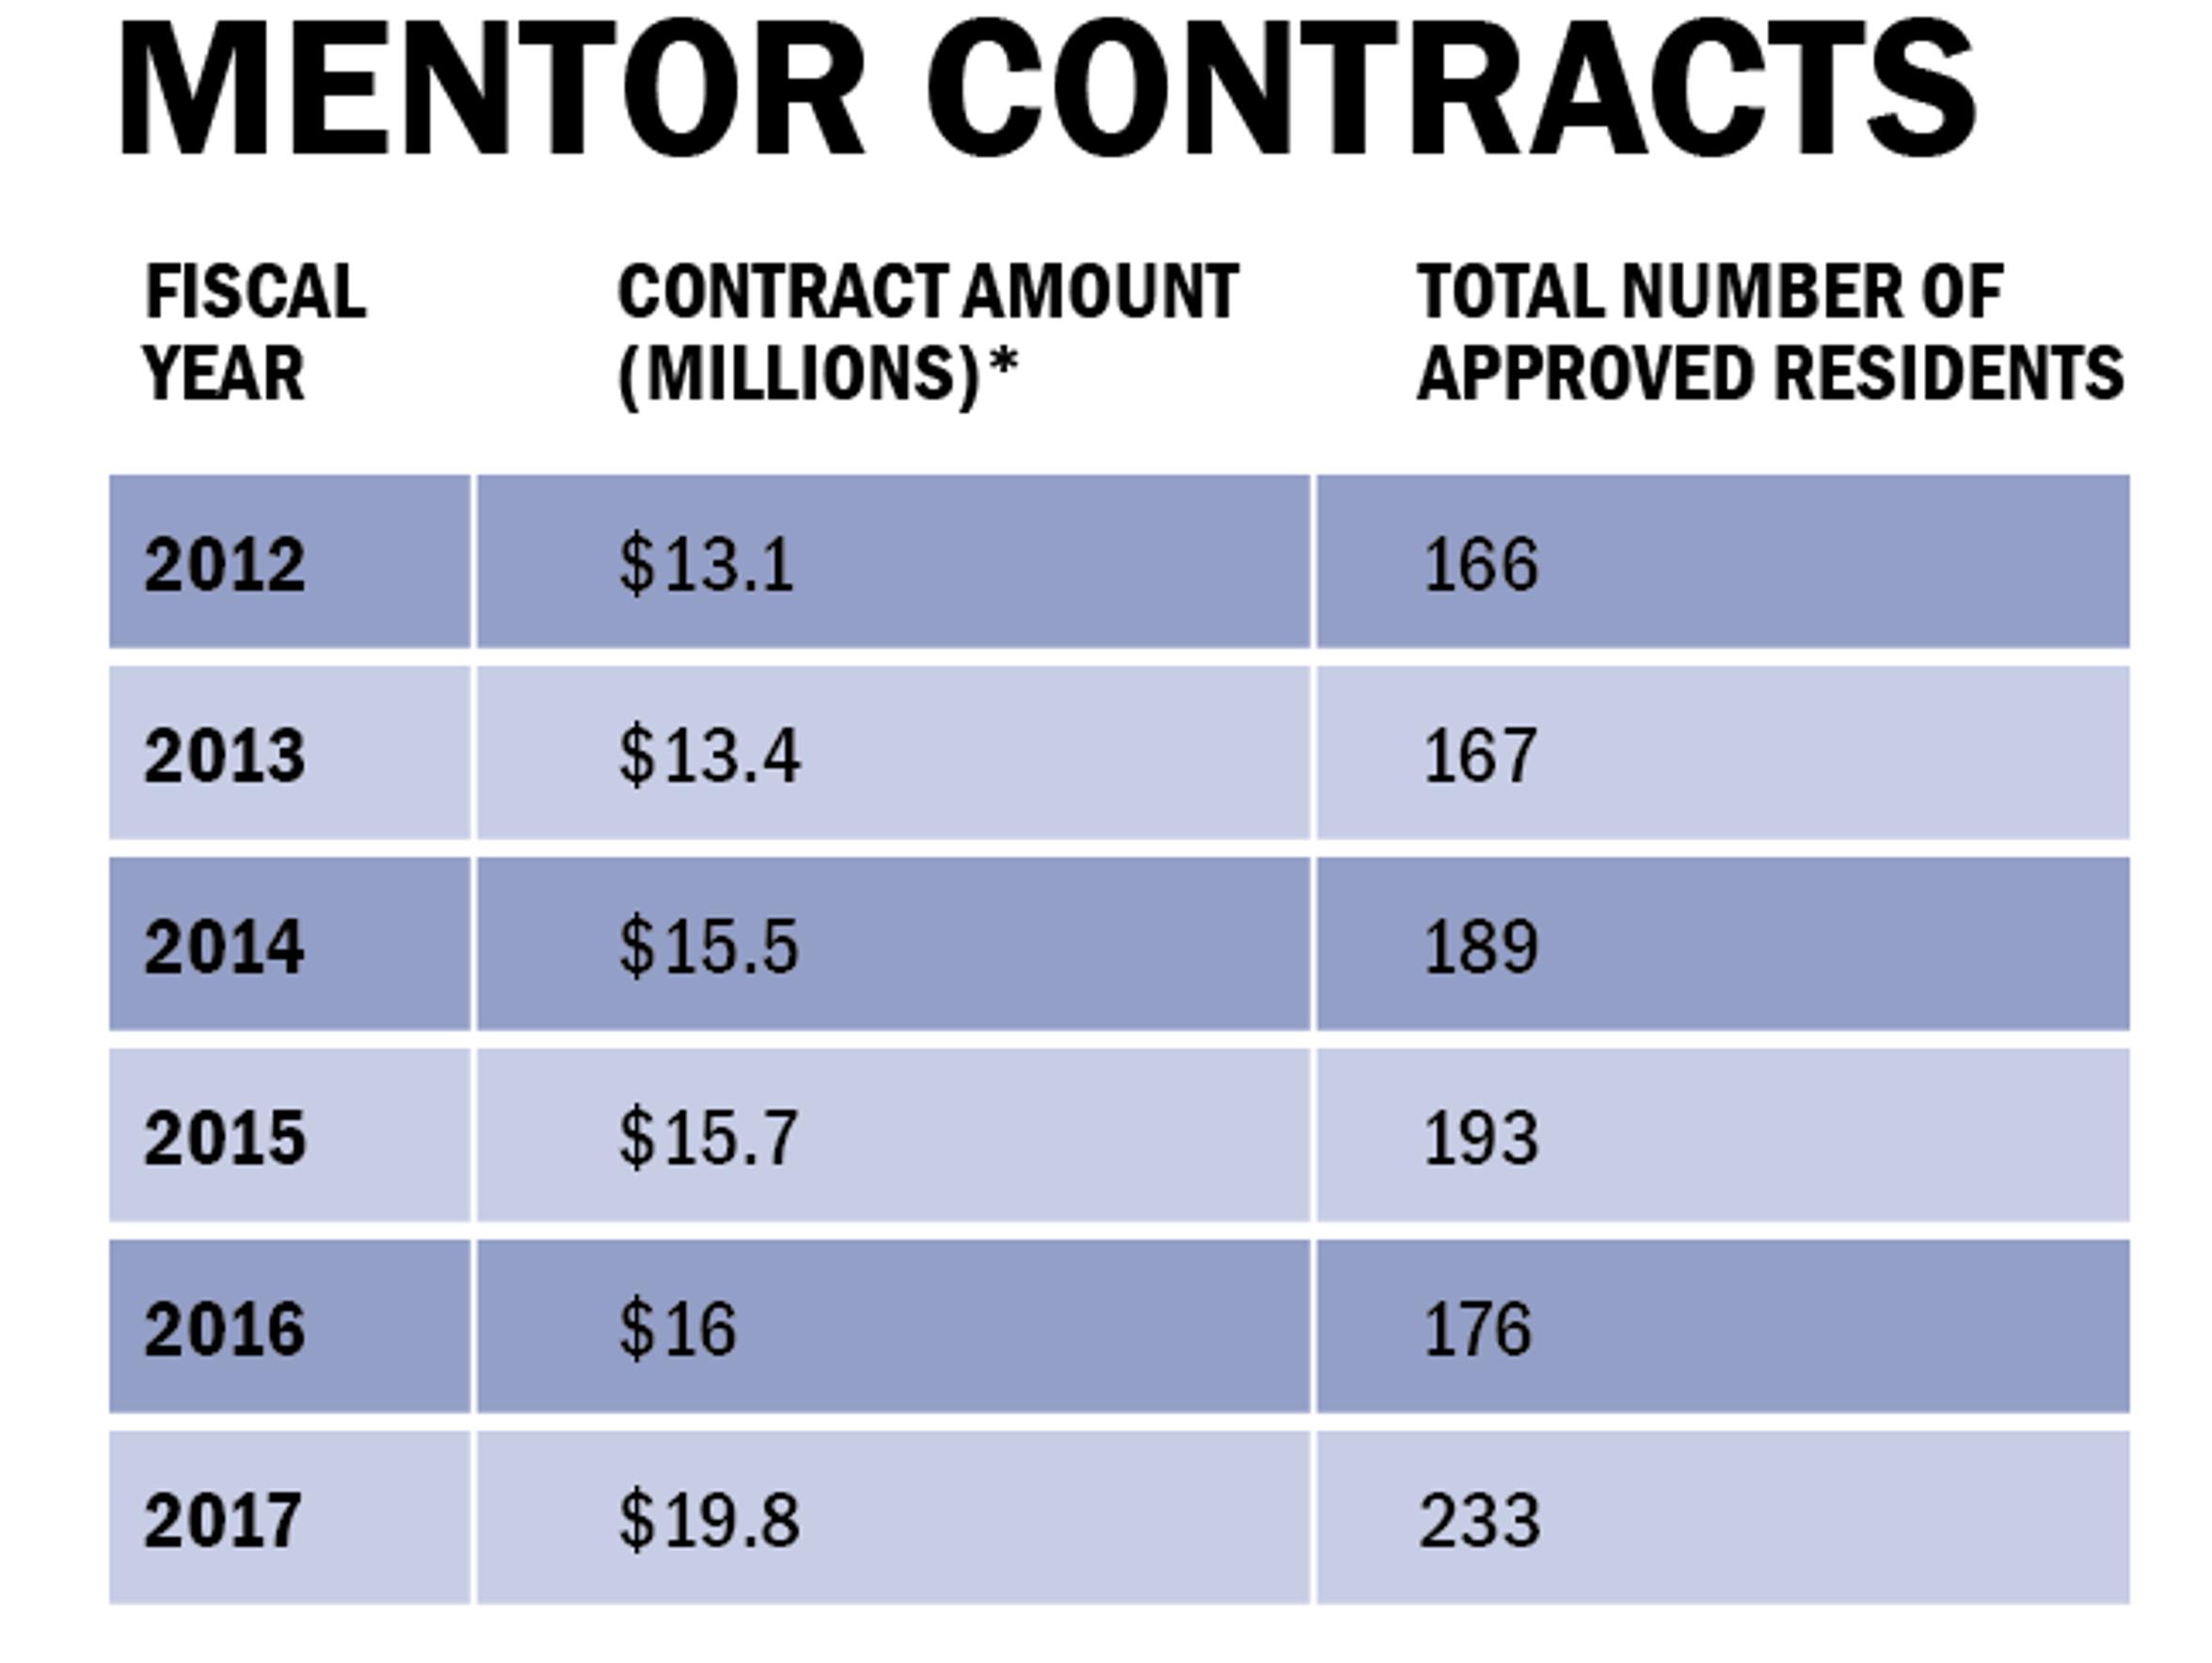 The mentor network employee portal - South Carolina Mentor Contracts